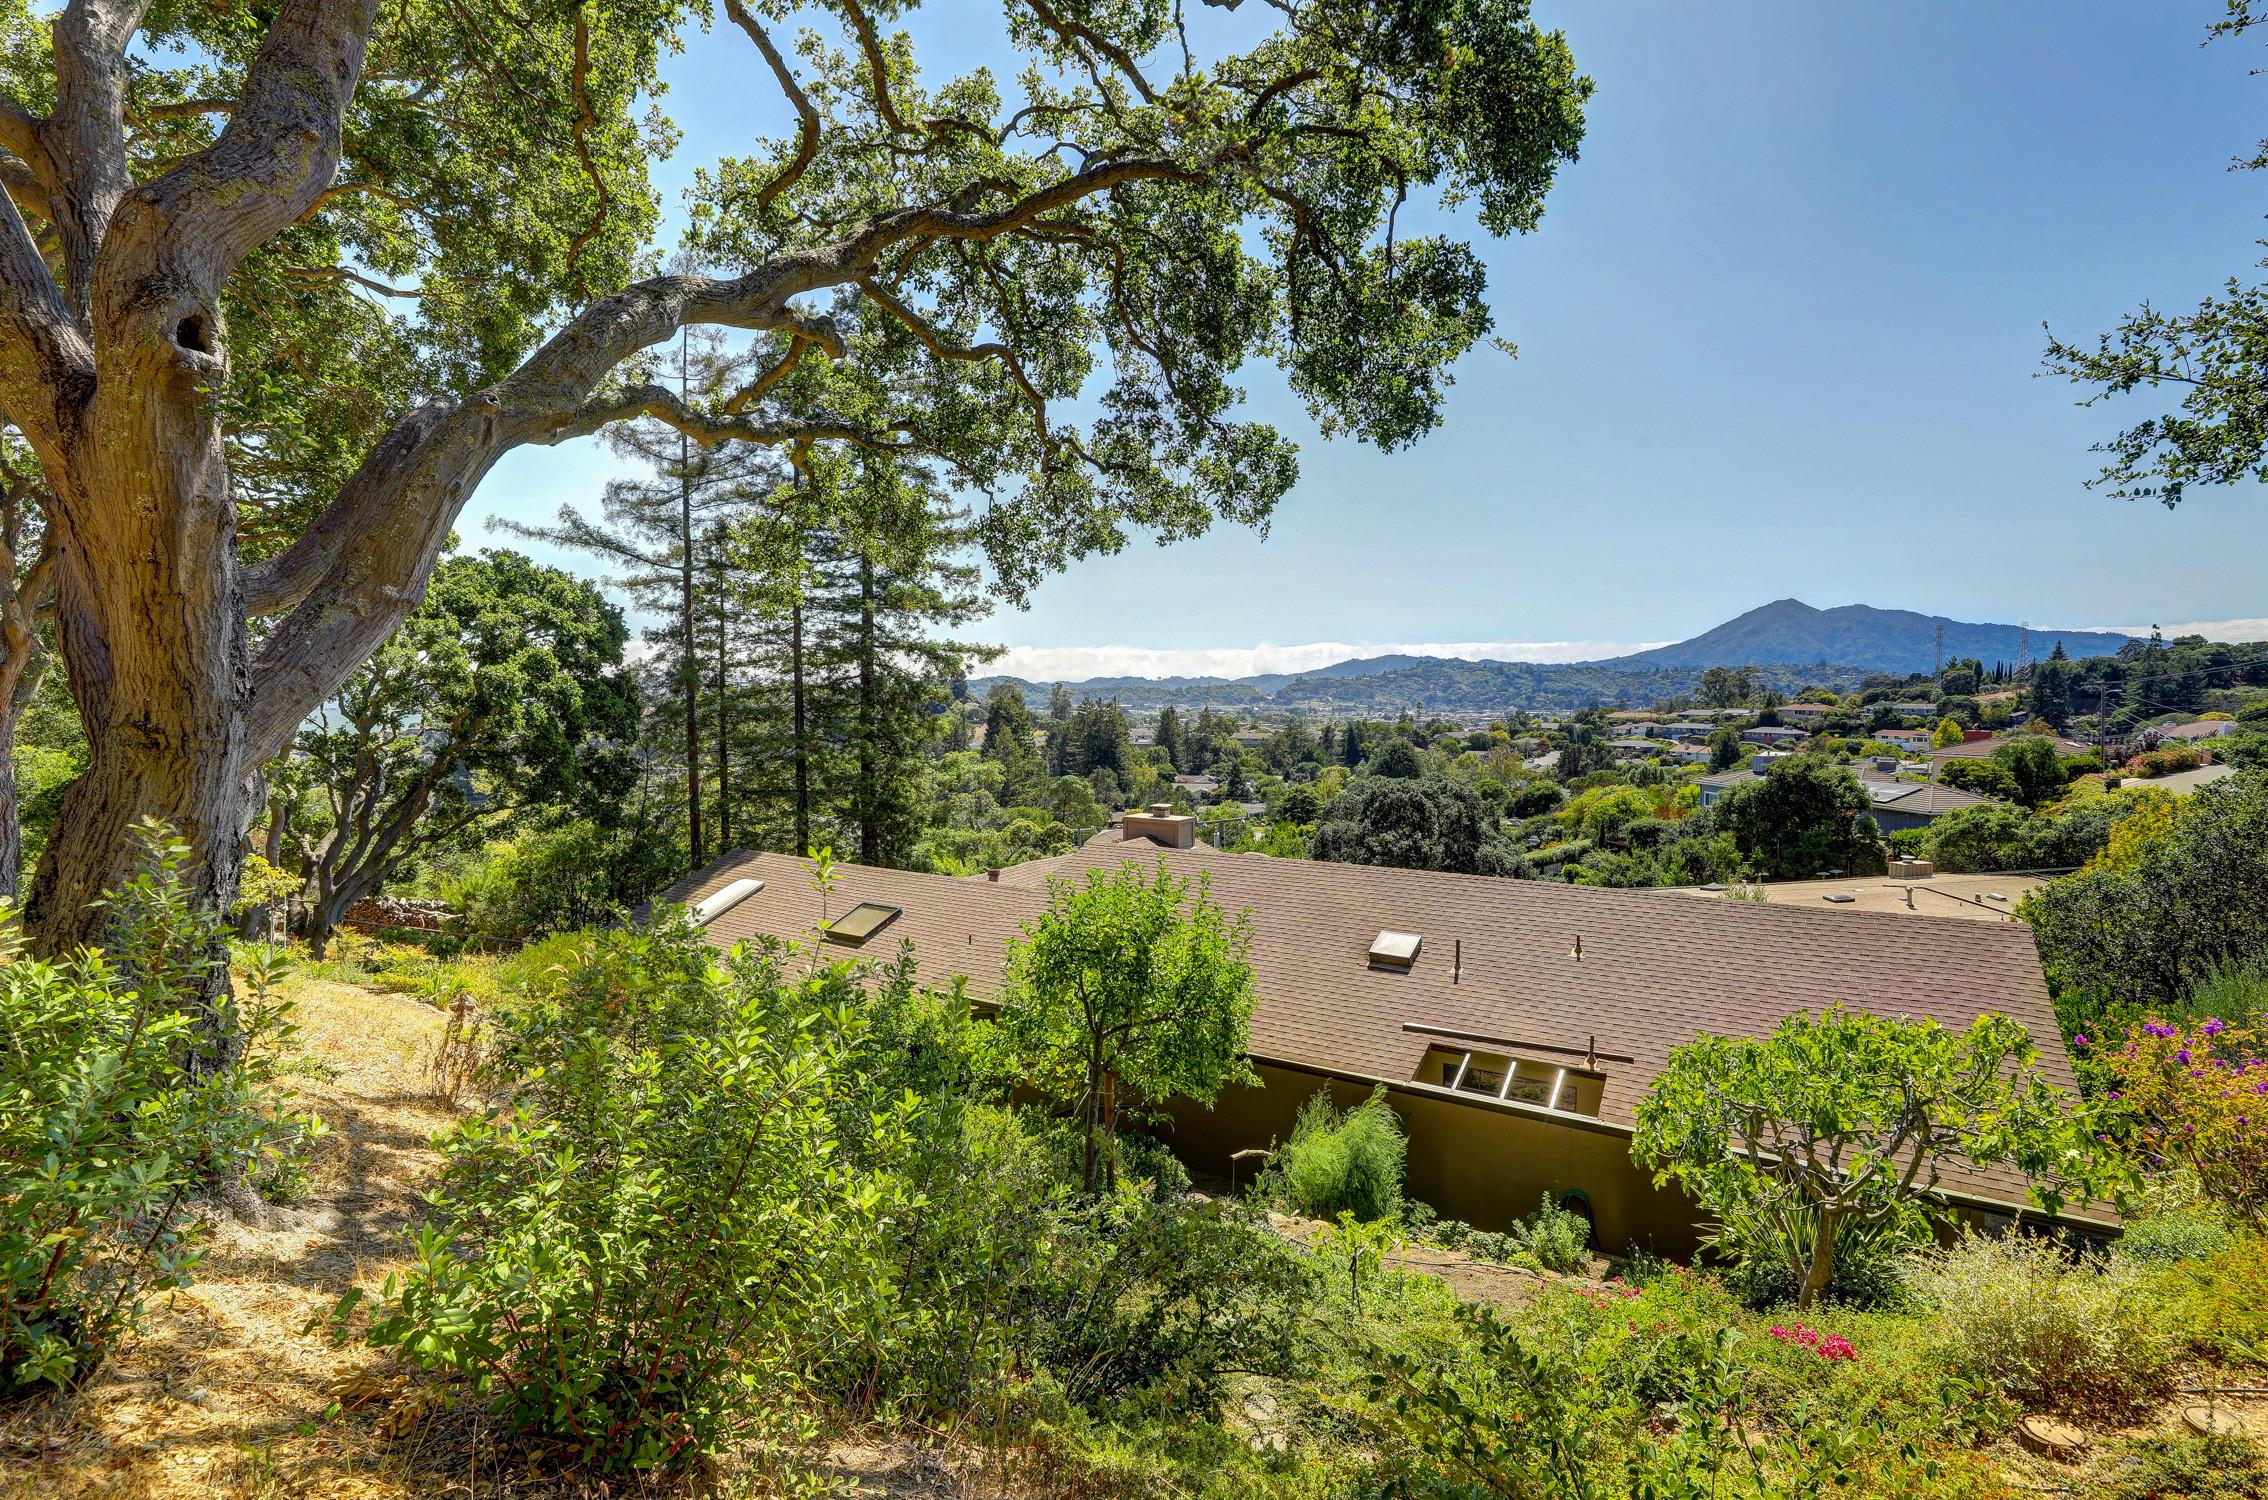 16Dorian 87 MLSSan Rafael Real Estate - Listed by Julia Fitzpatrick + Allie Fornesi Team Own Marin County .jpg